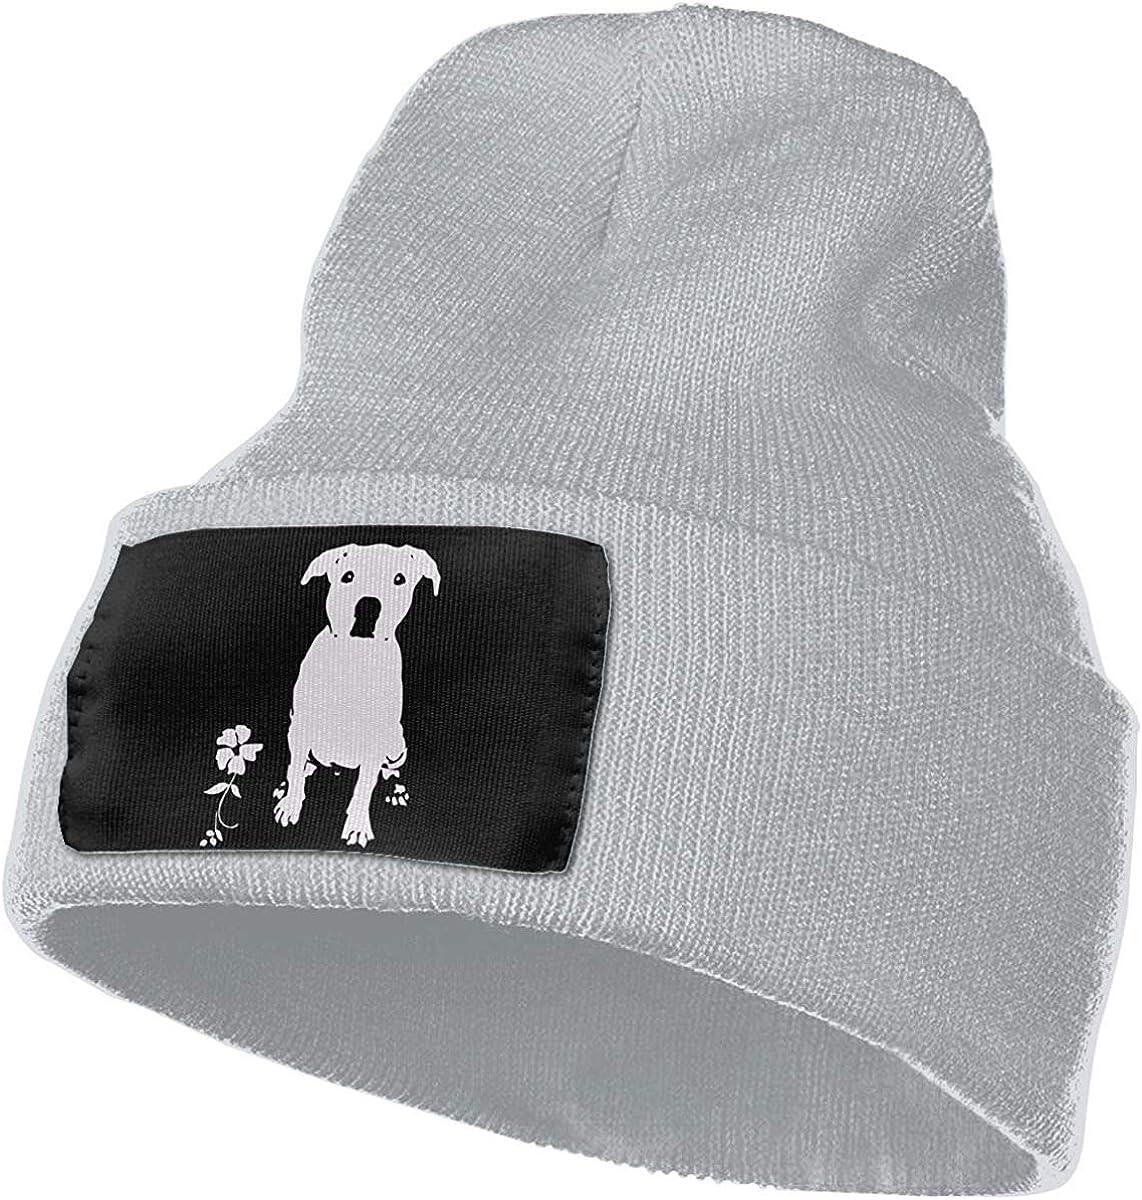 Rupde Laert Jerome Mens Womens 100/% Acrylic Knitting Hat Cap Pitbull Dog Silhouette-1 Fashion Ski Cap